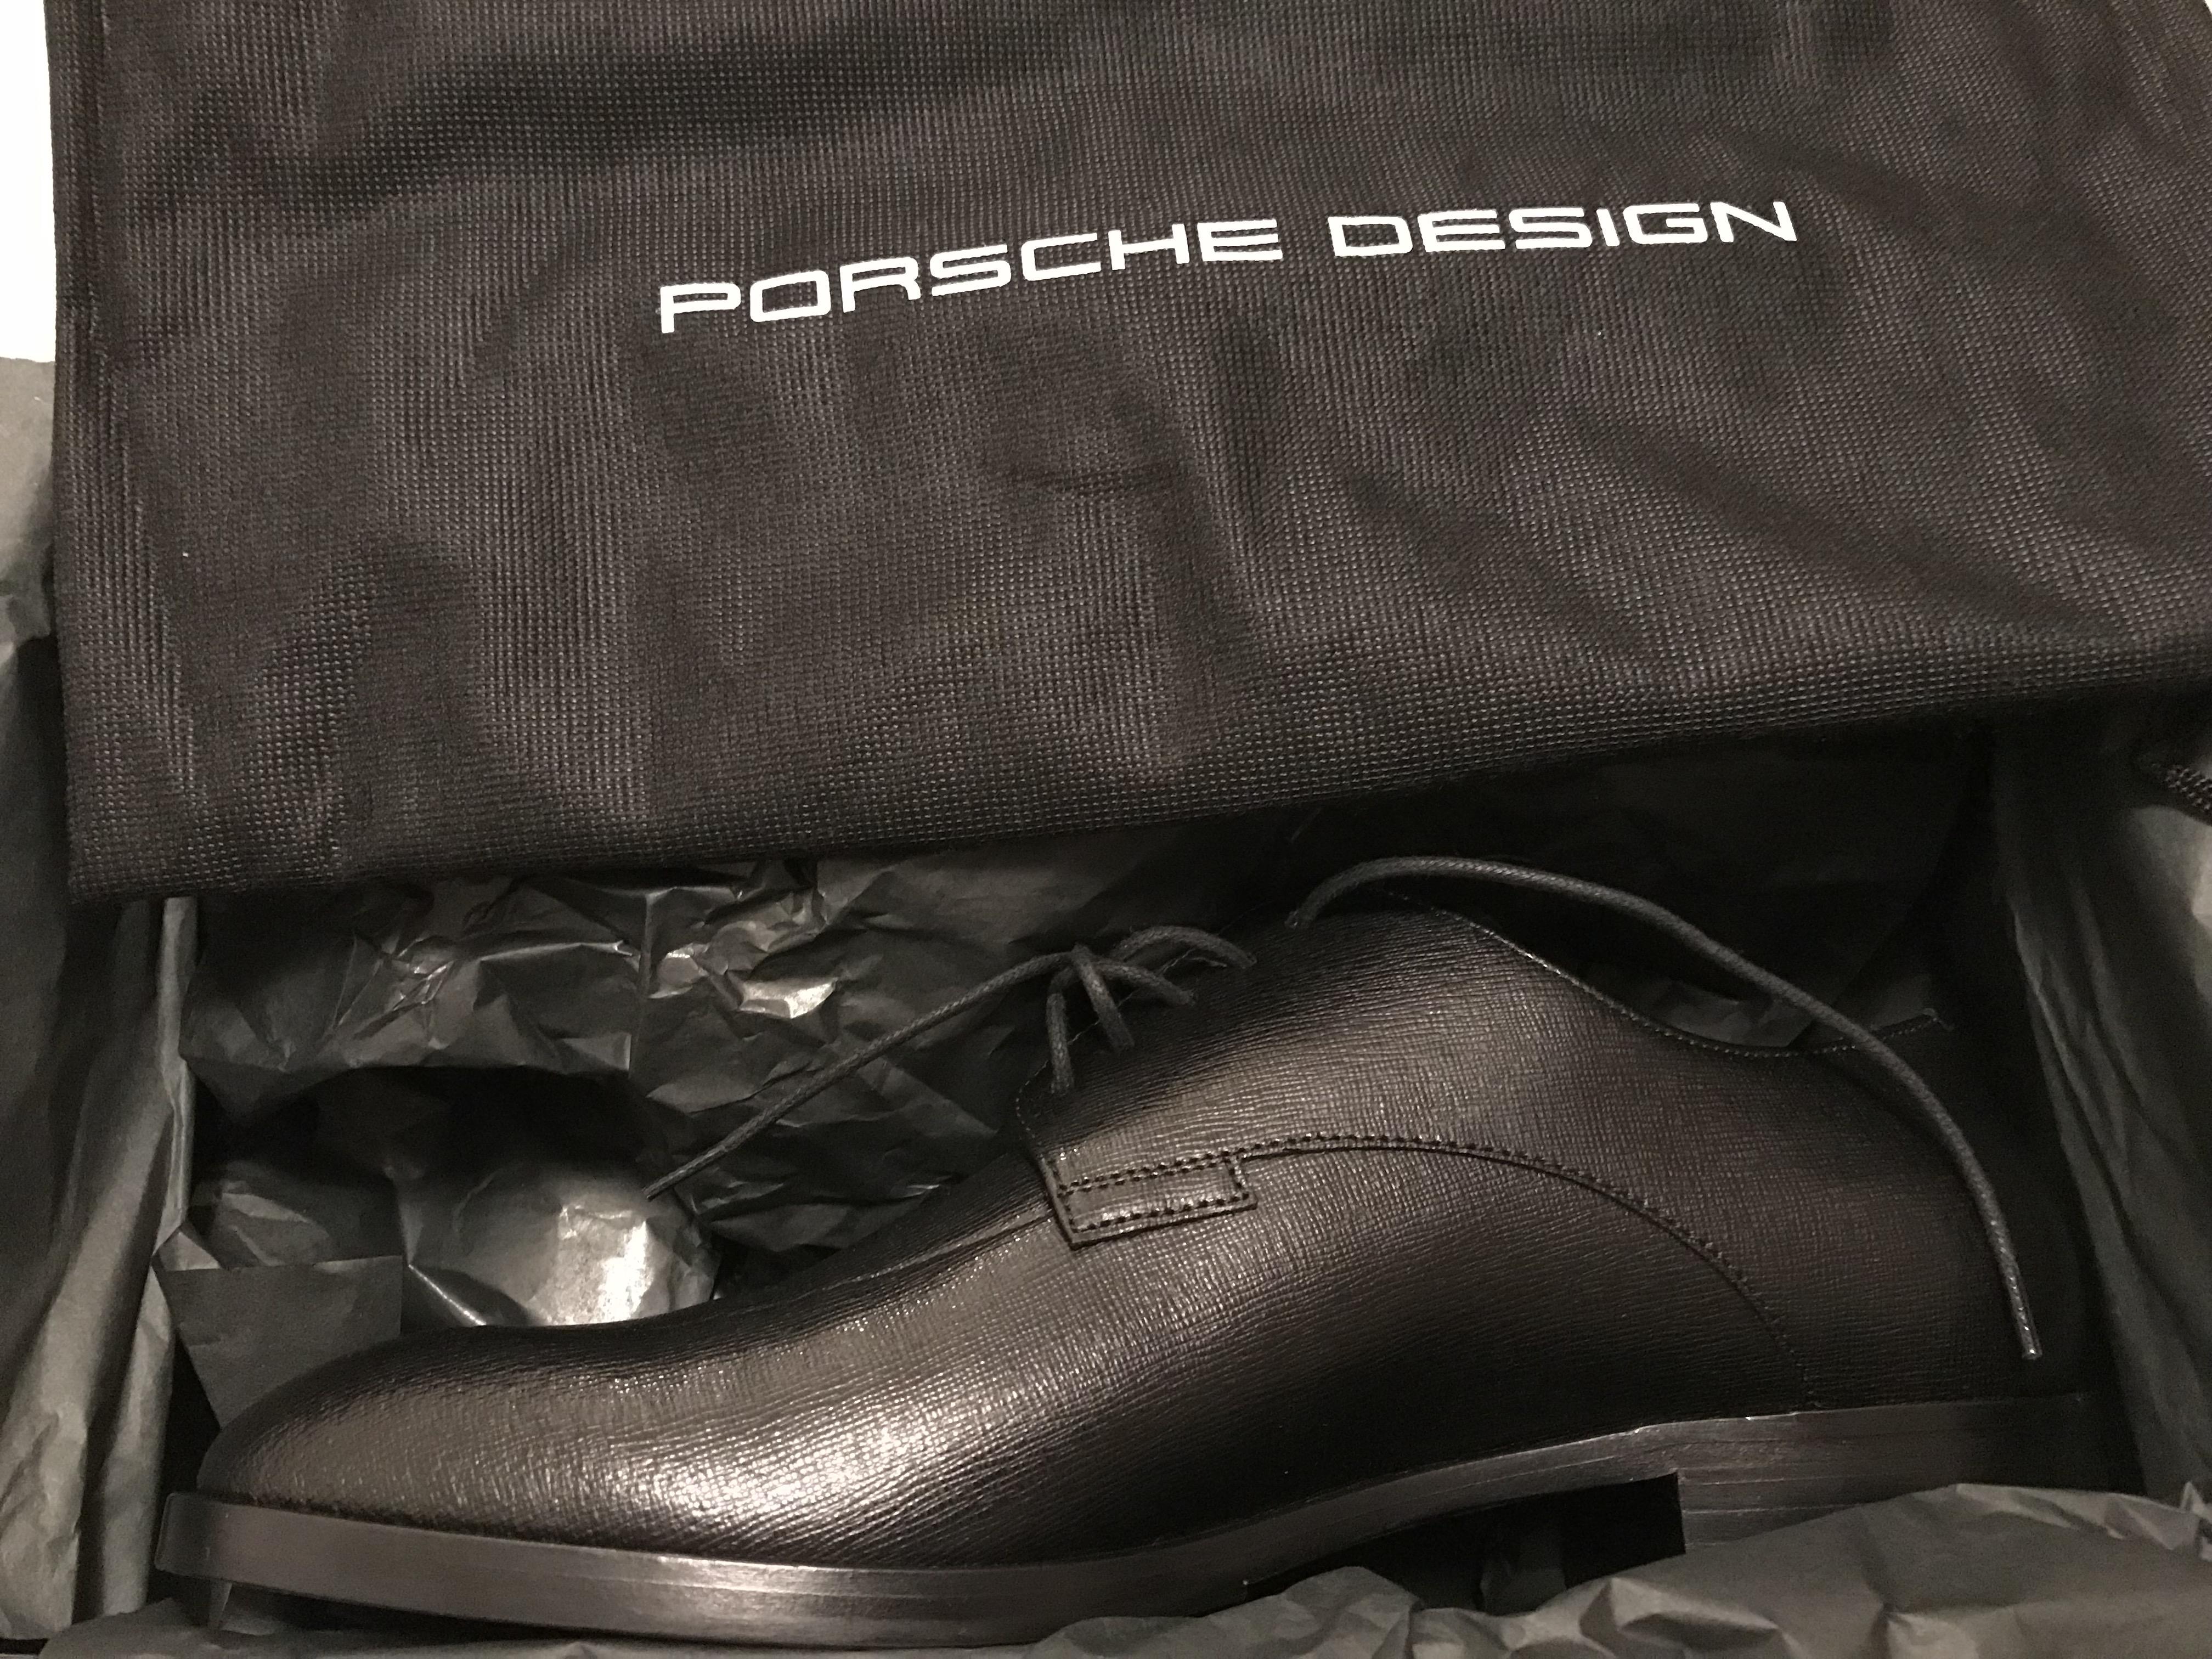 [Lokal TK Maxx Hannover]  Halbschue Porsche Design Las Vegas Lace Up Saffiano Black